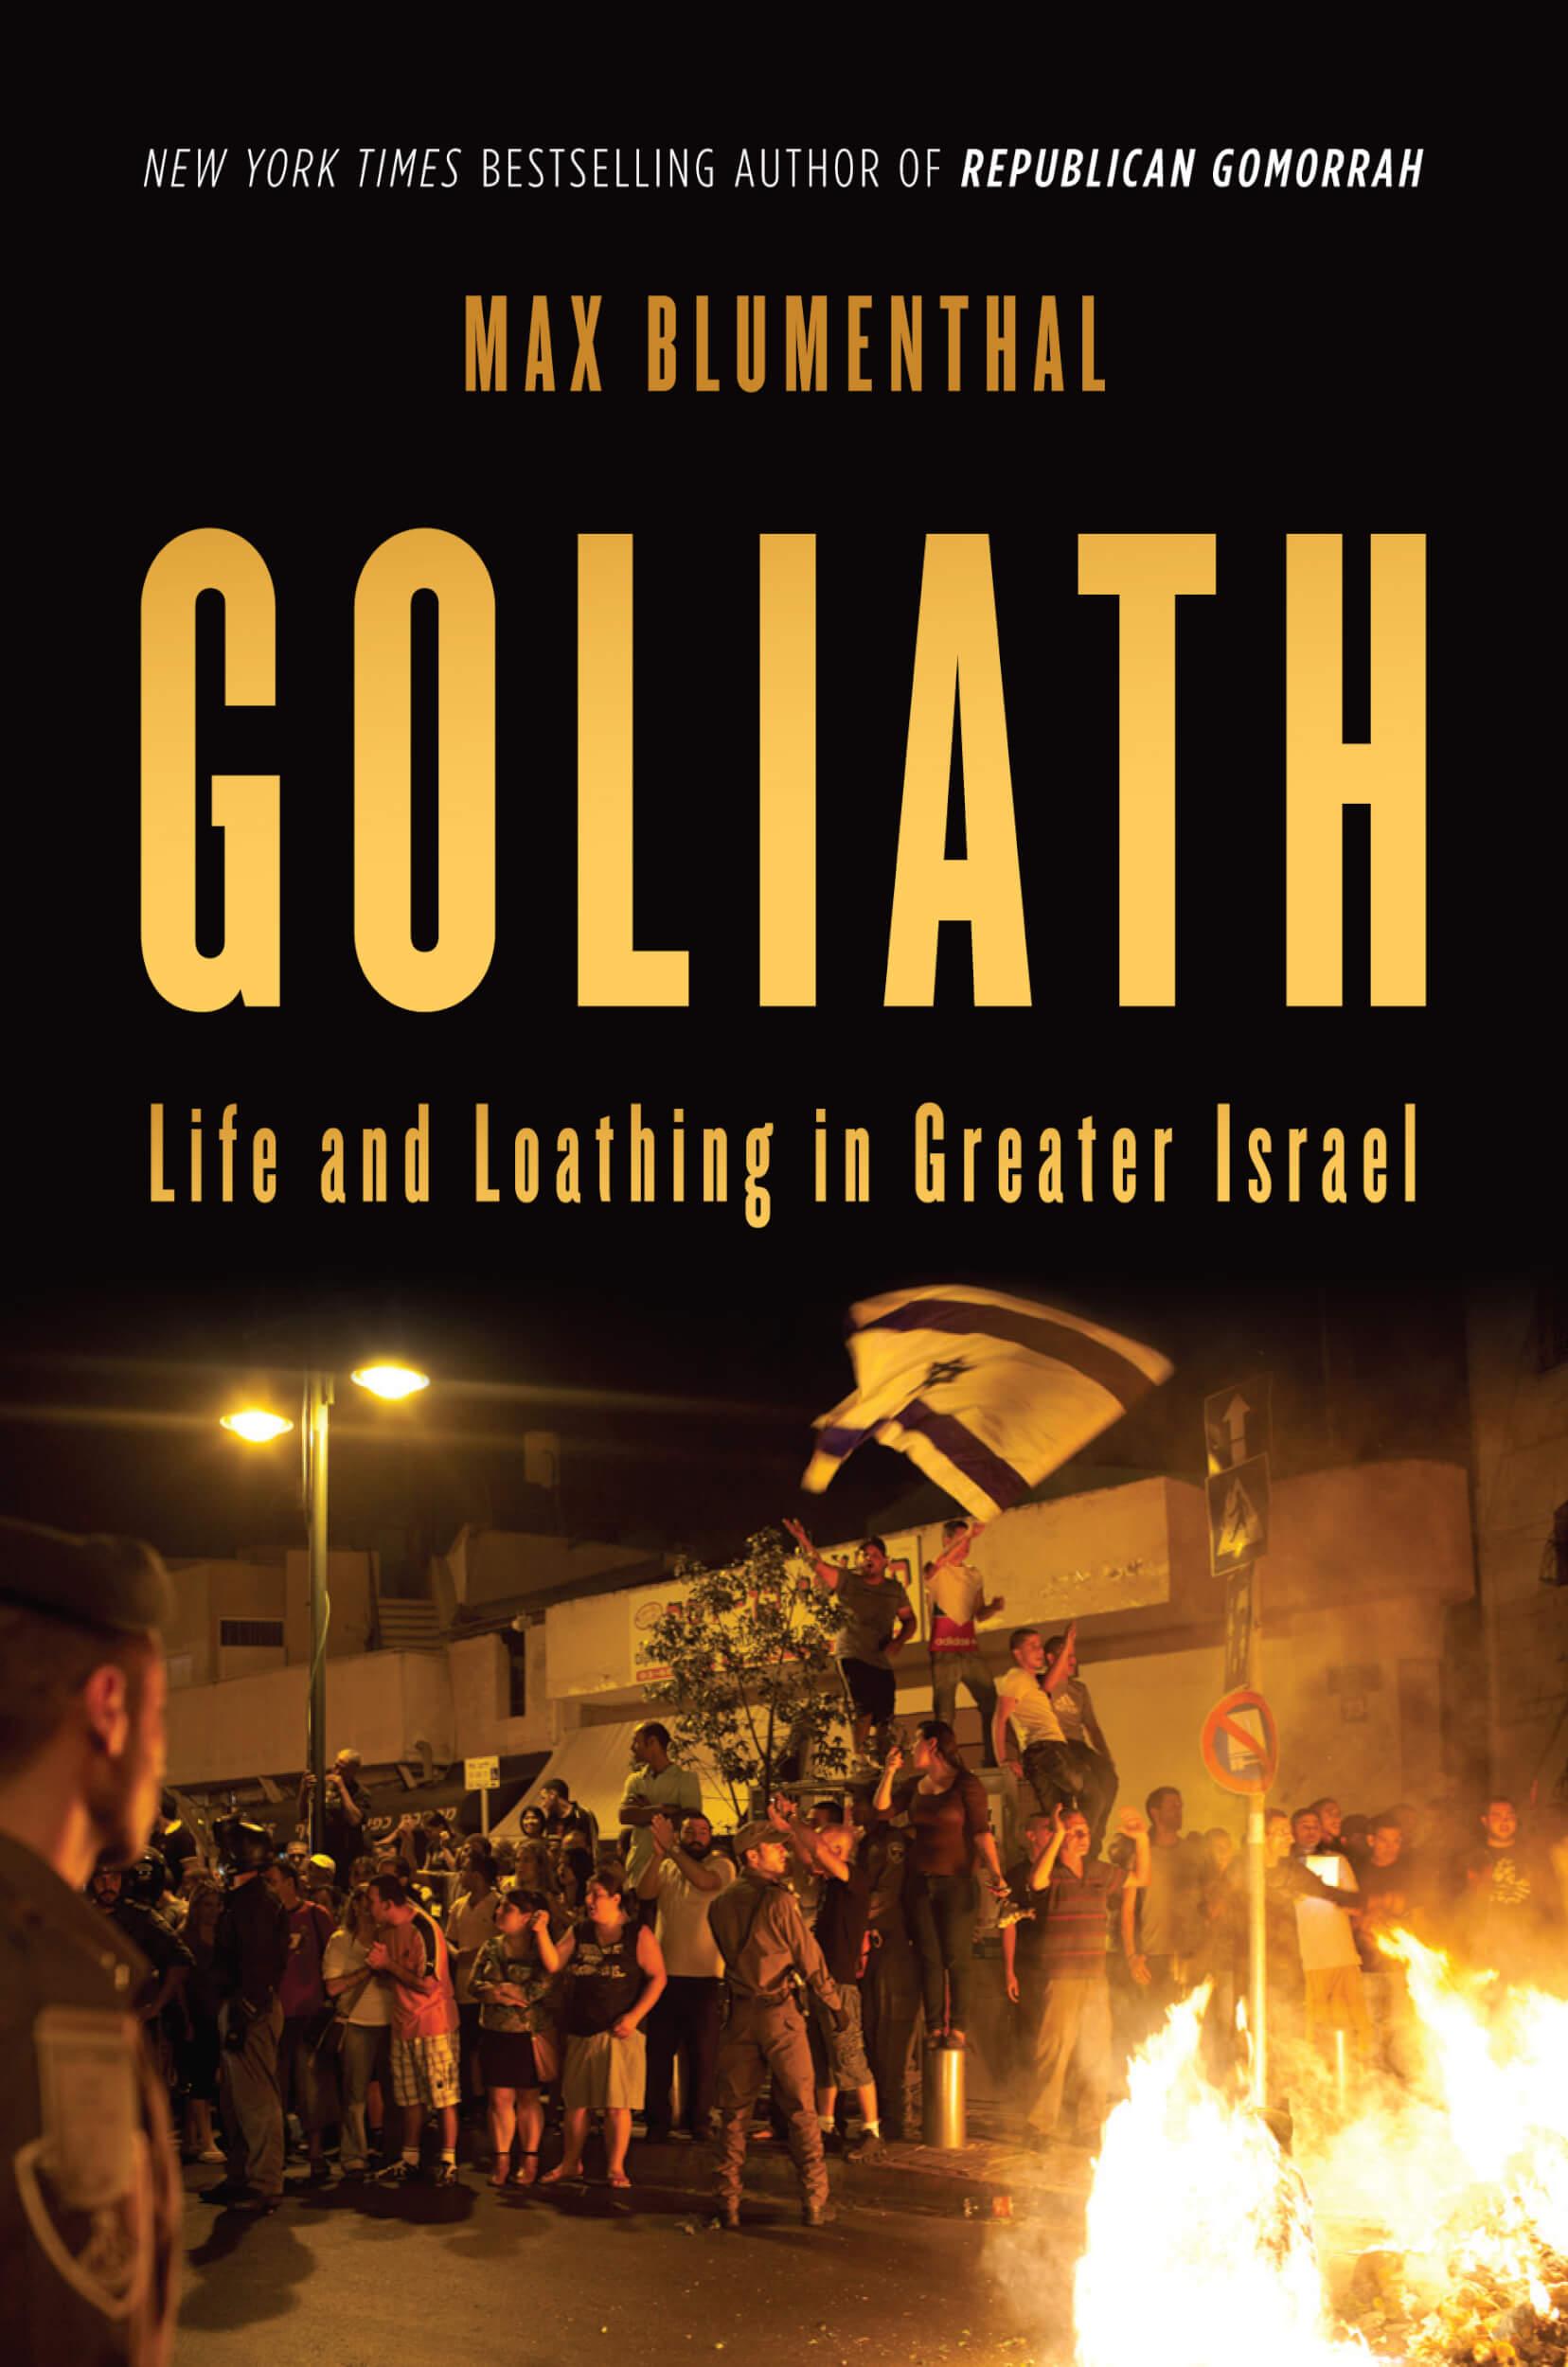 Eric Alterman's 'I Hate Max Blumenthal' Handbook